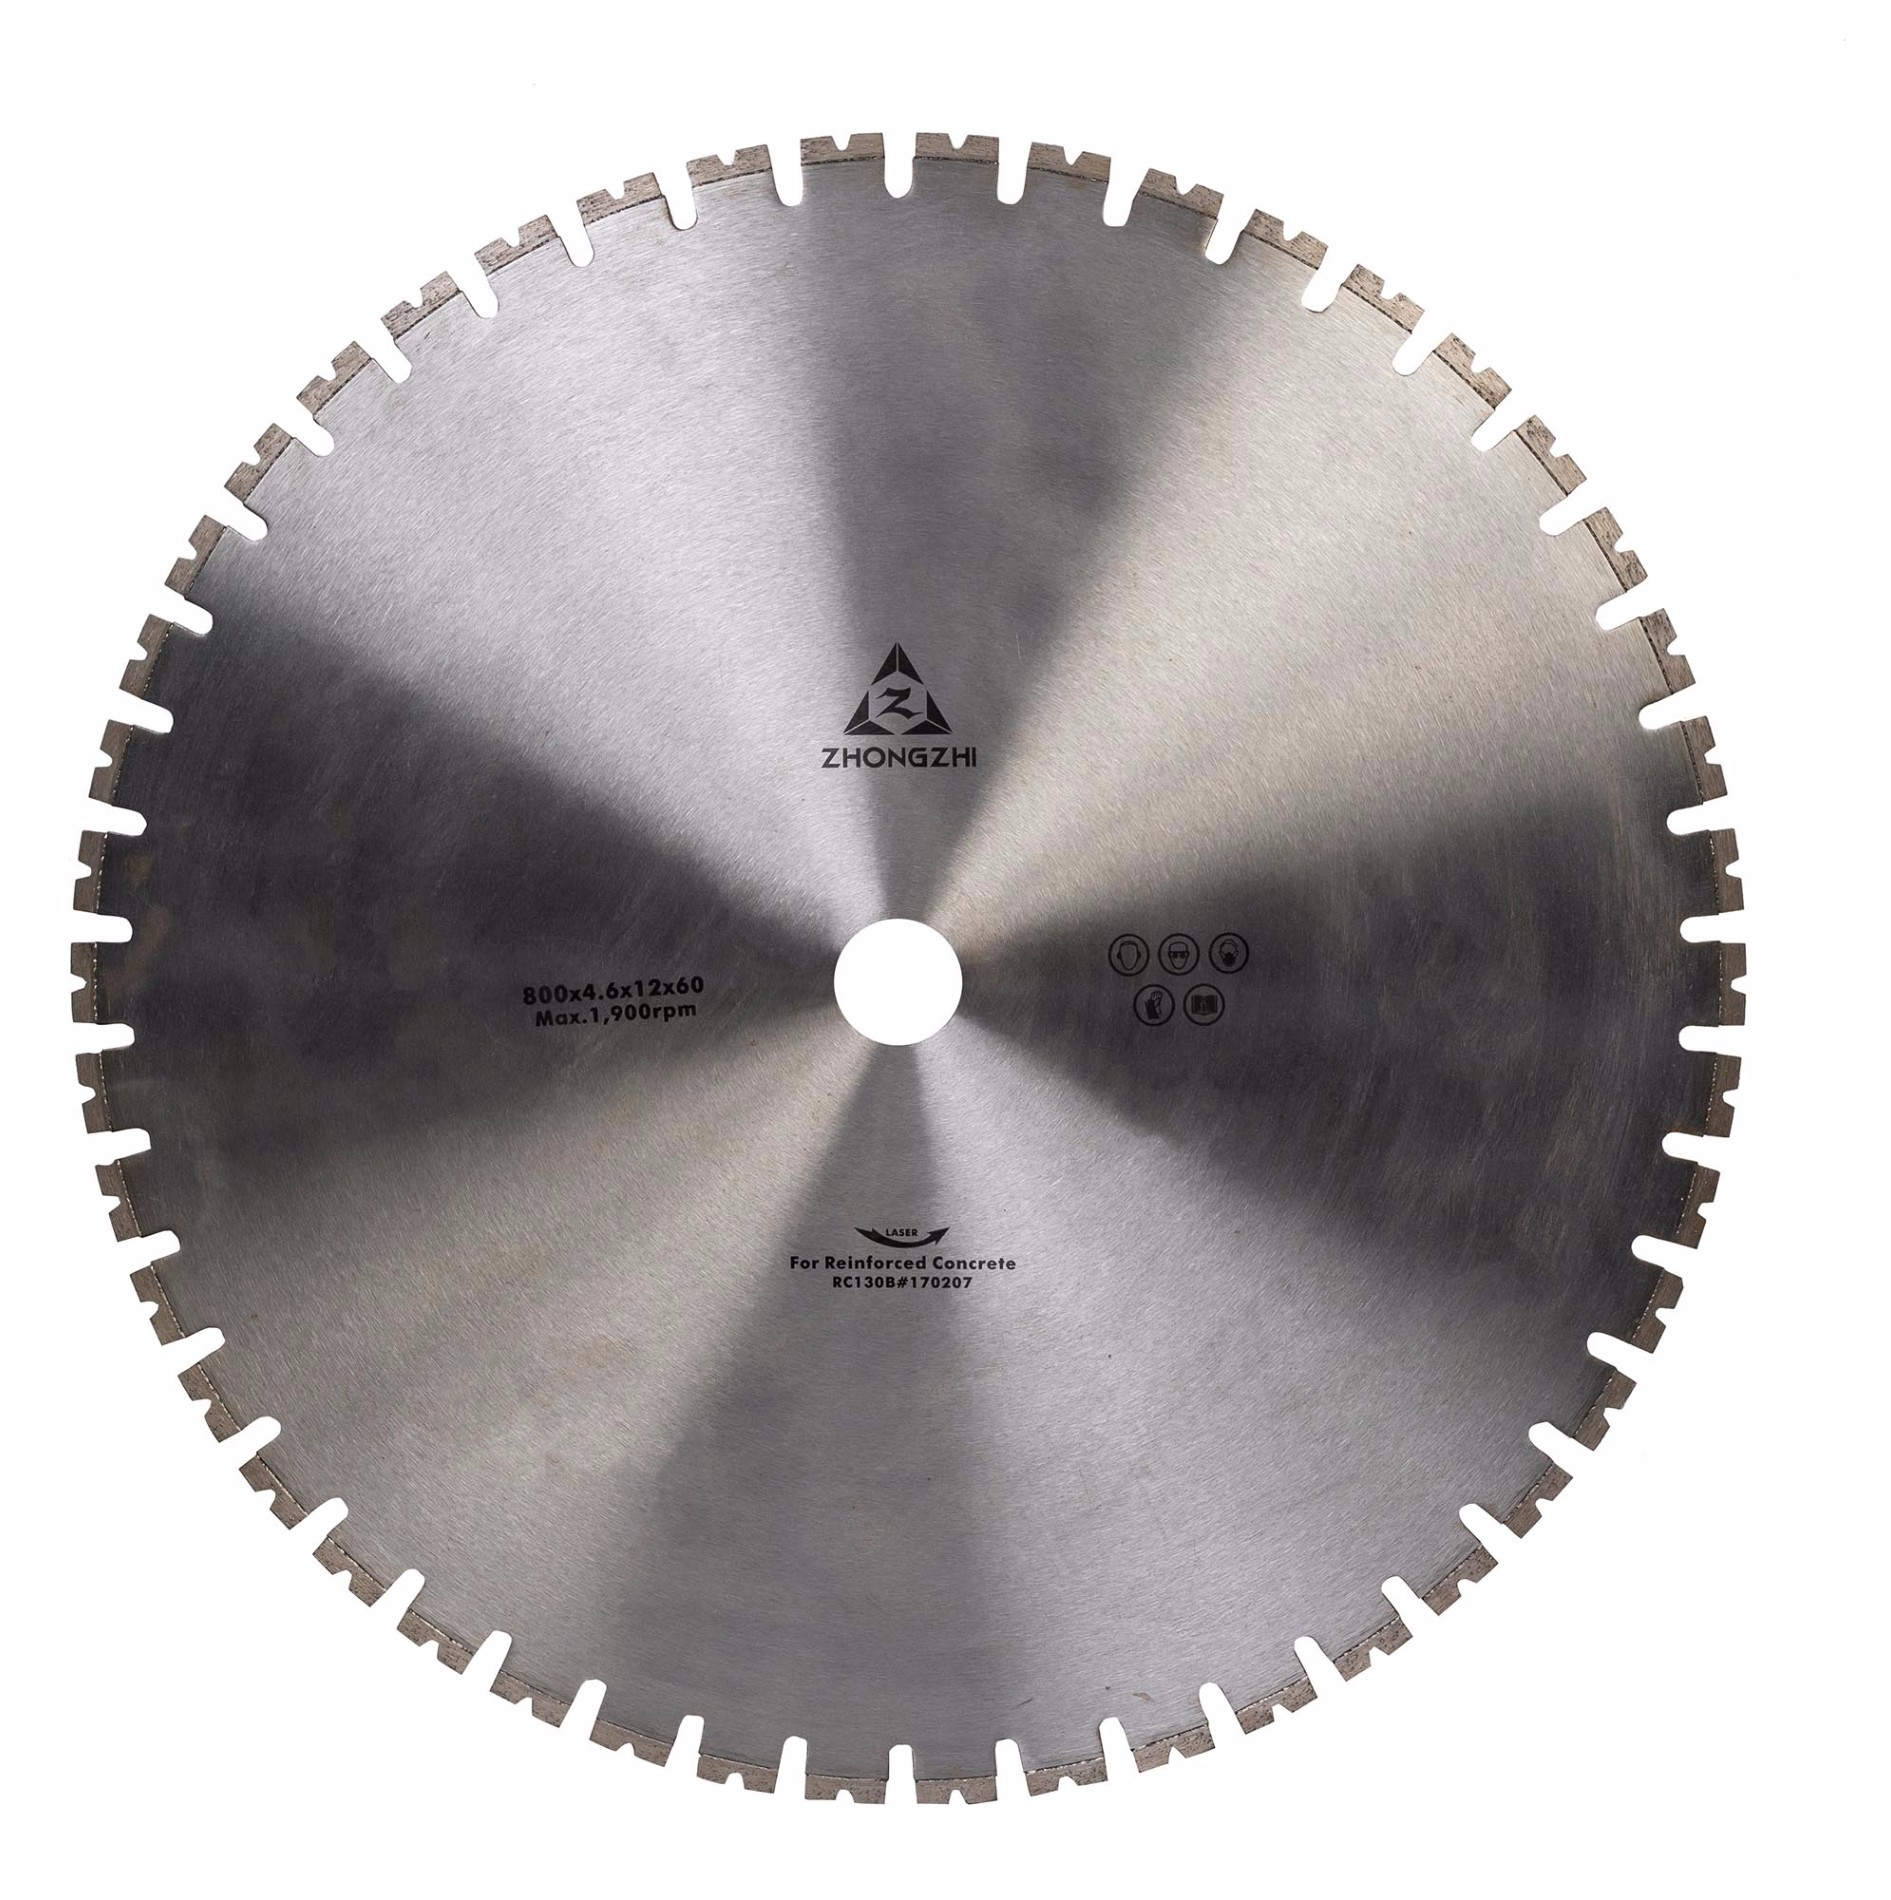 Sharp Laser Diamond Wall Saw Blade for Construction